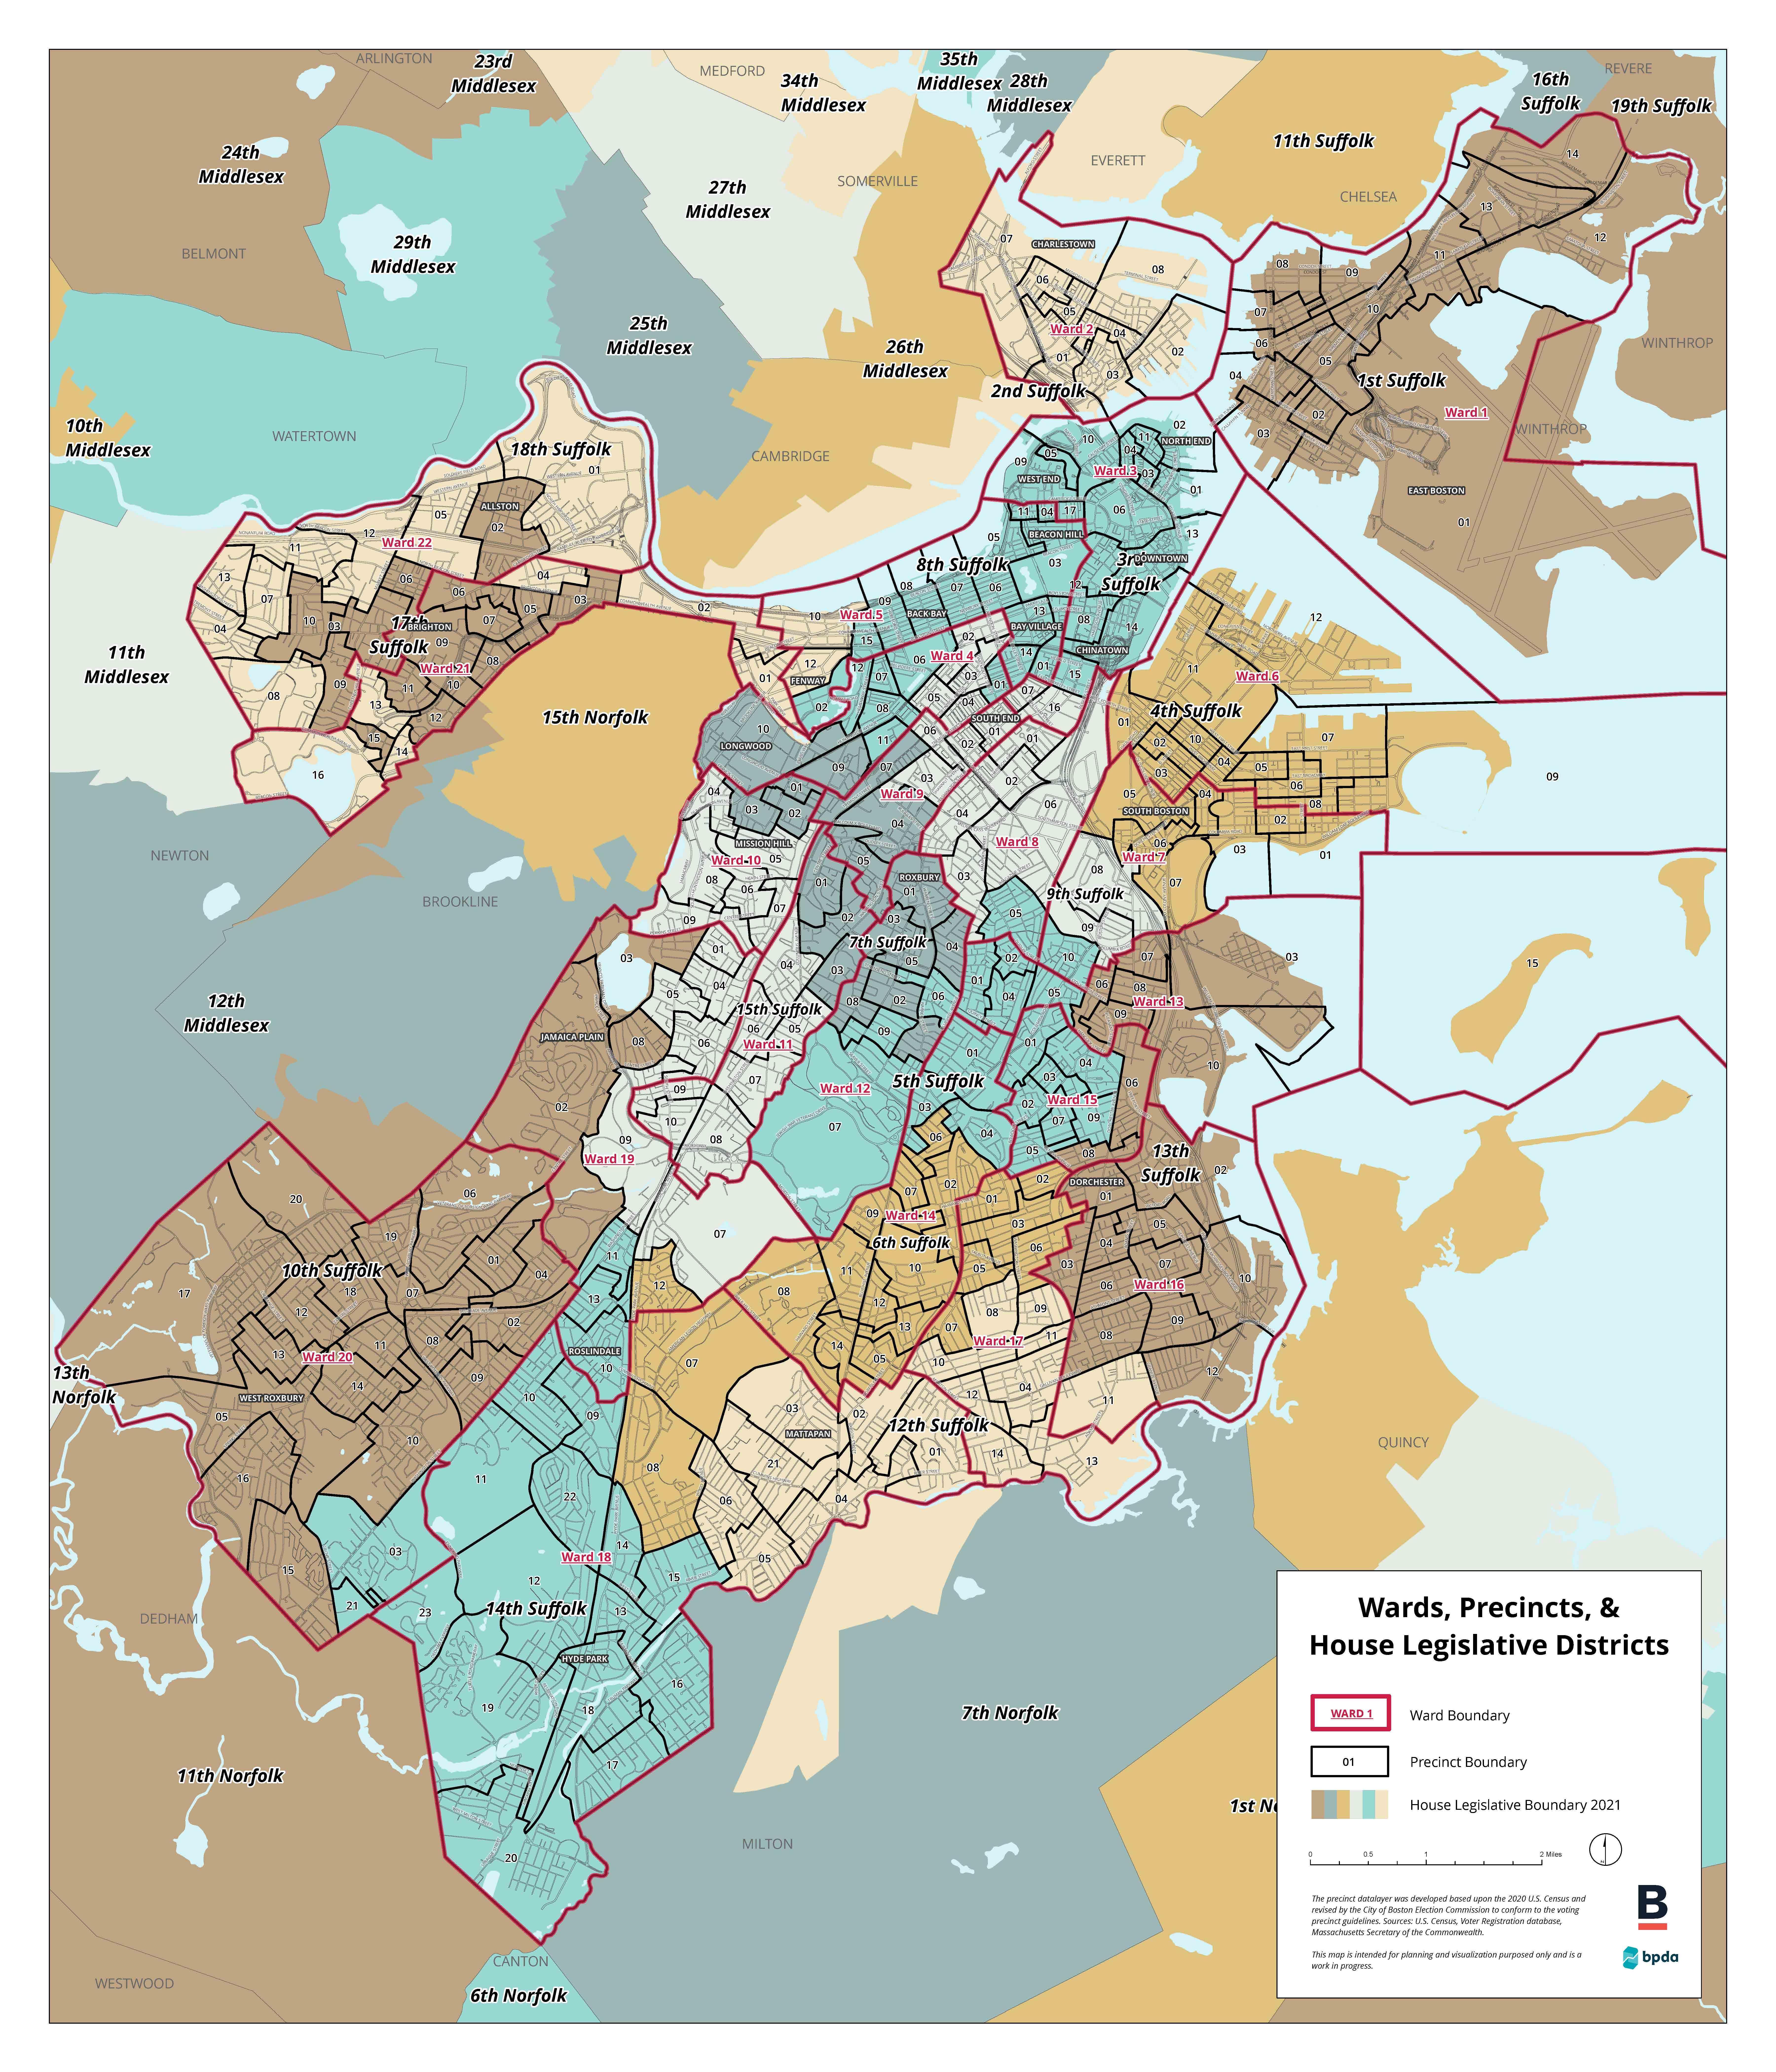 Electoral Maps Boston Planning Development Agency